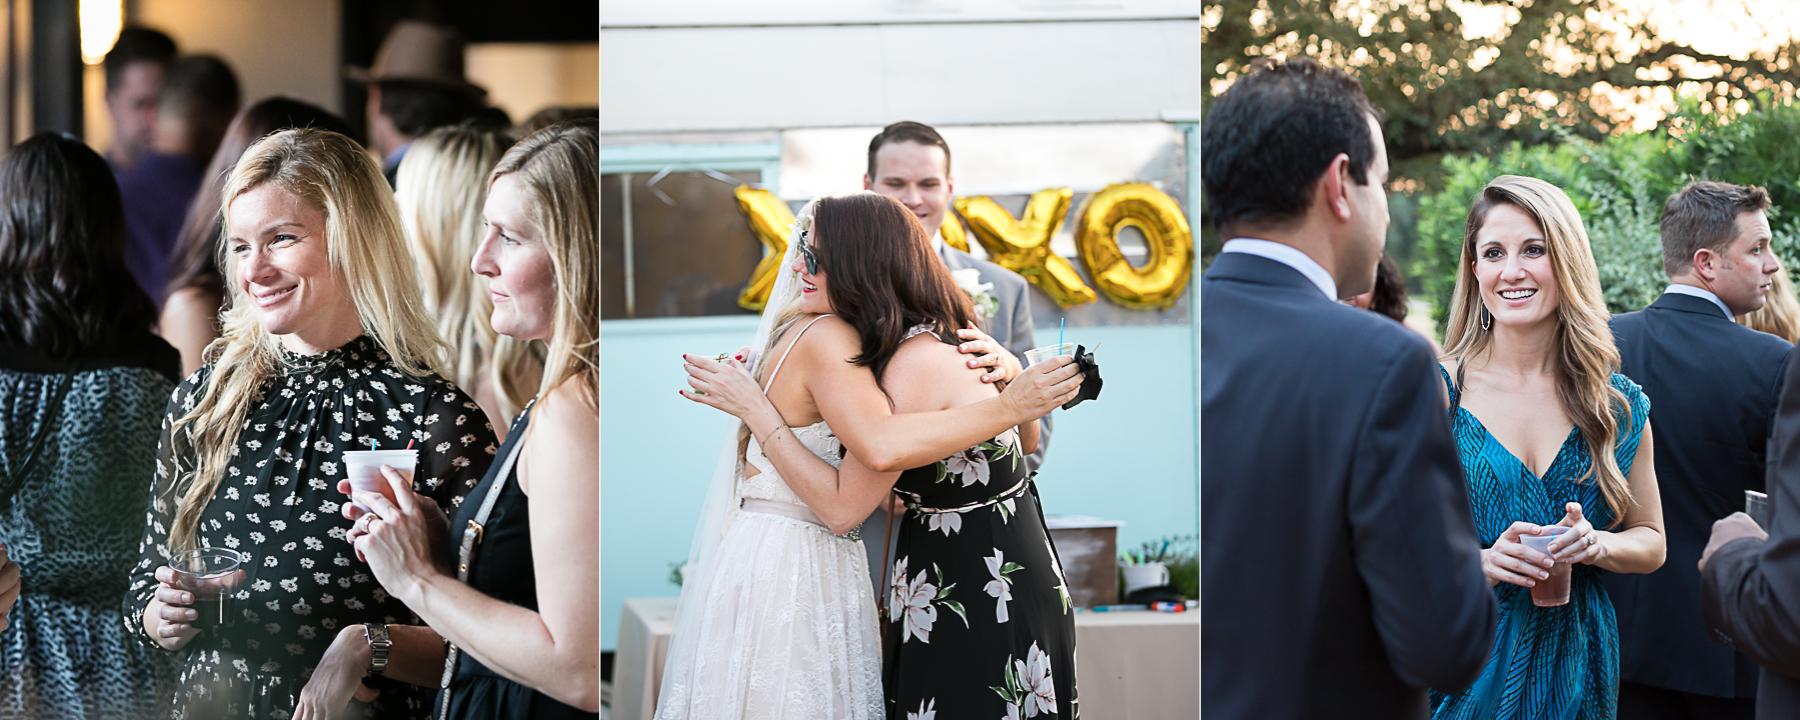 candid-wedding-photography-texas.jpg